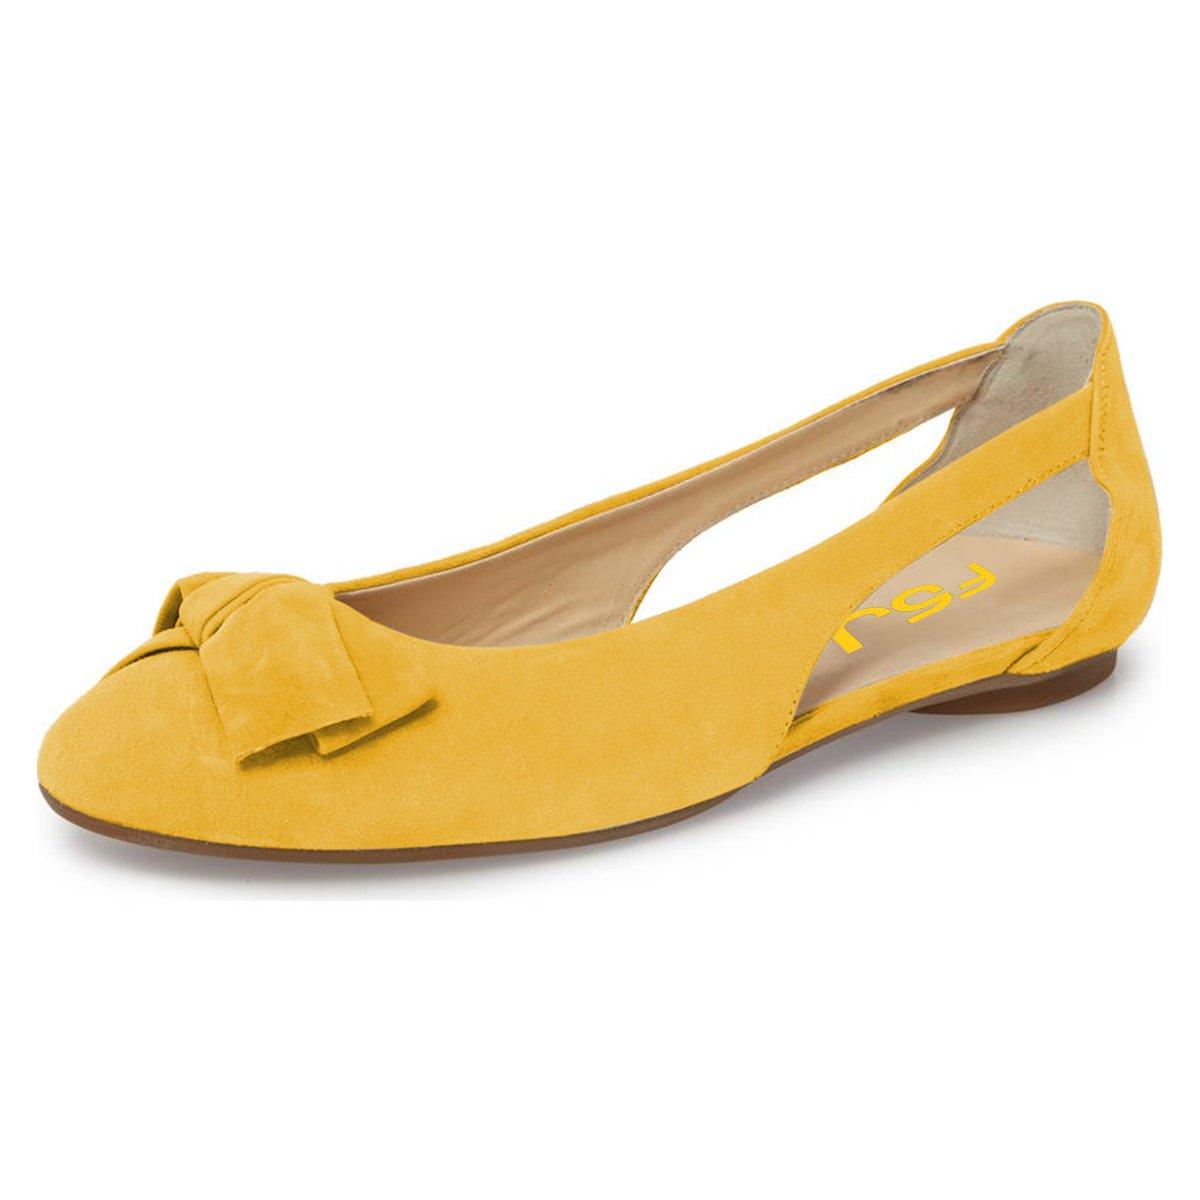 FSJ Women Cute Round Toe Ballet Flats Slip On Low Heels Pumps Bowknot Cutout Comfy Shoes Size 4-15 US